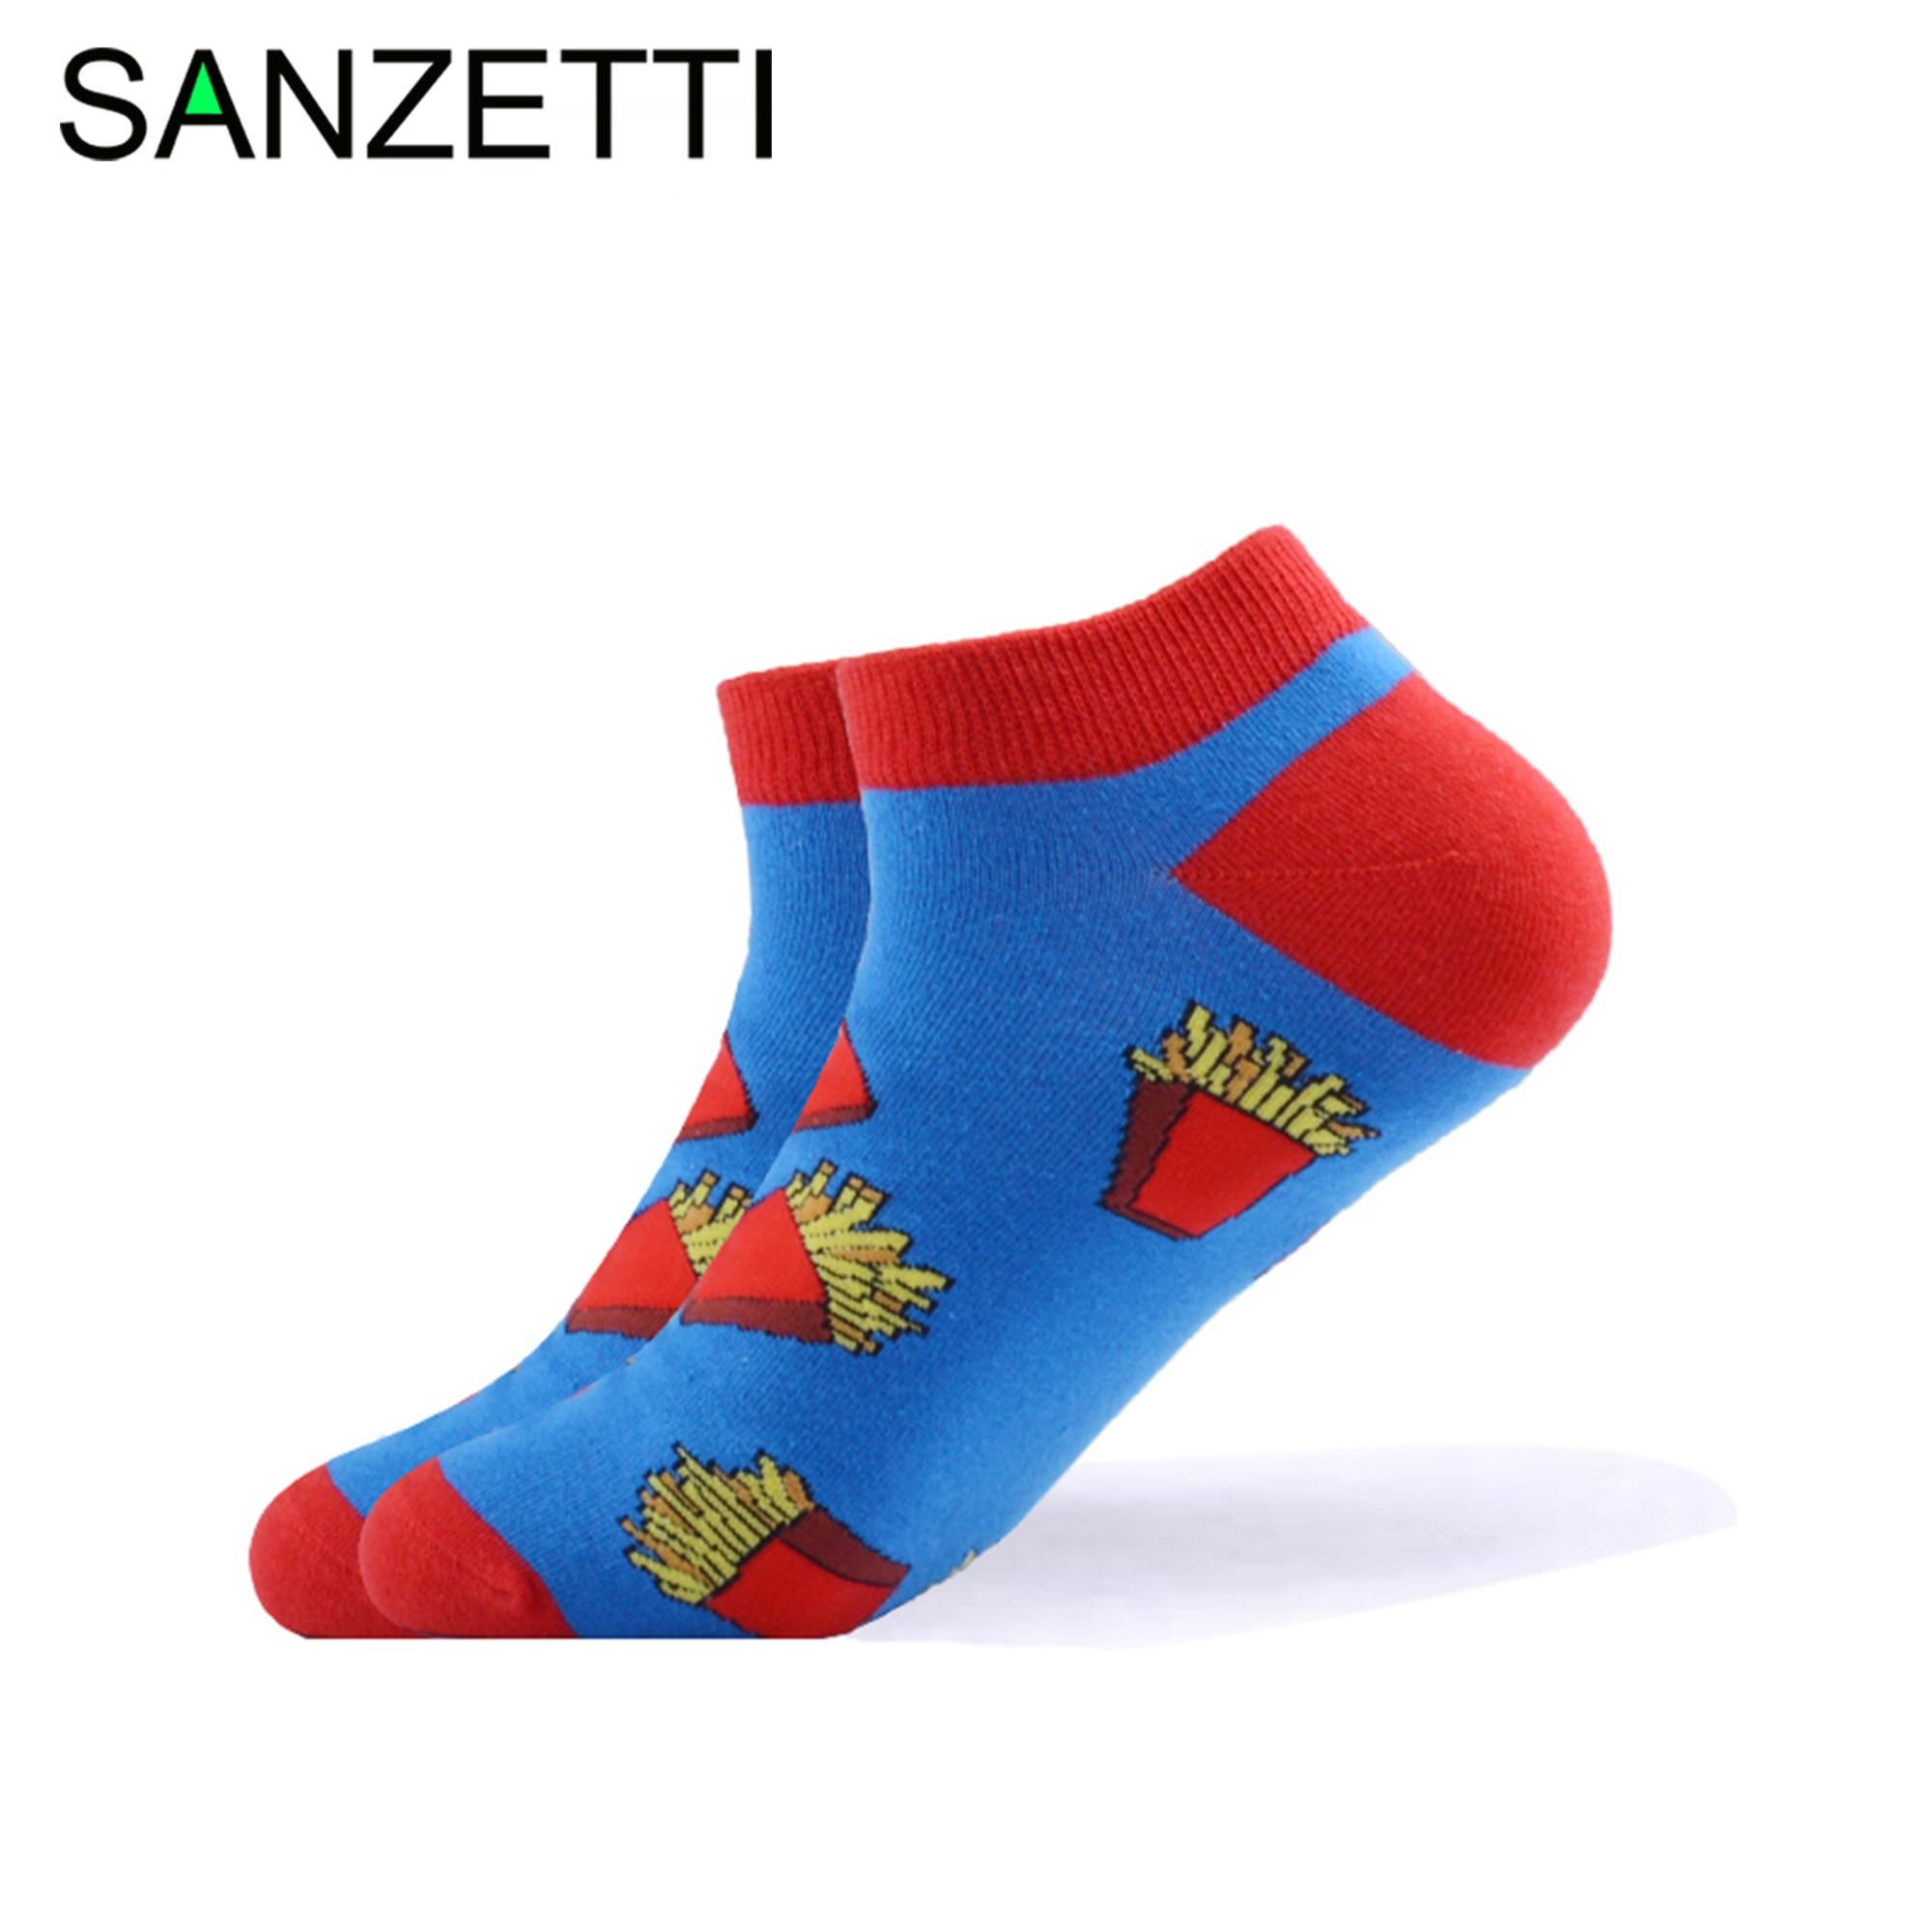 SANZETTI 1 Pair 2020 New Men's Summer Casual Ankle Socks Colorful Combed Cotton Socks Hamburger Pattern Dress Wedding Boat Socks